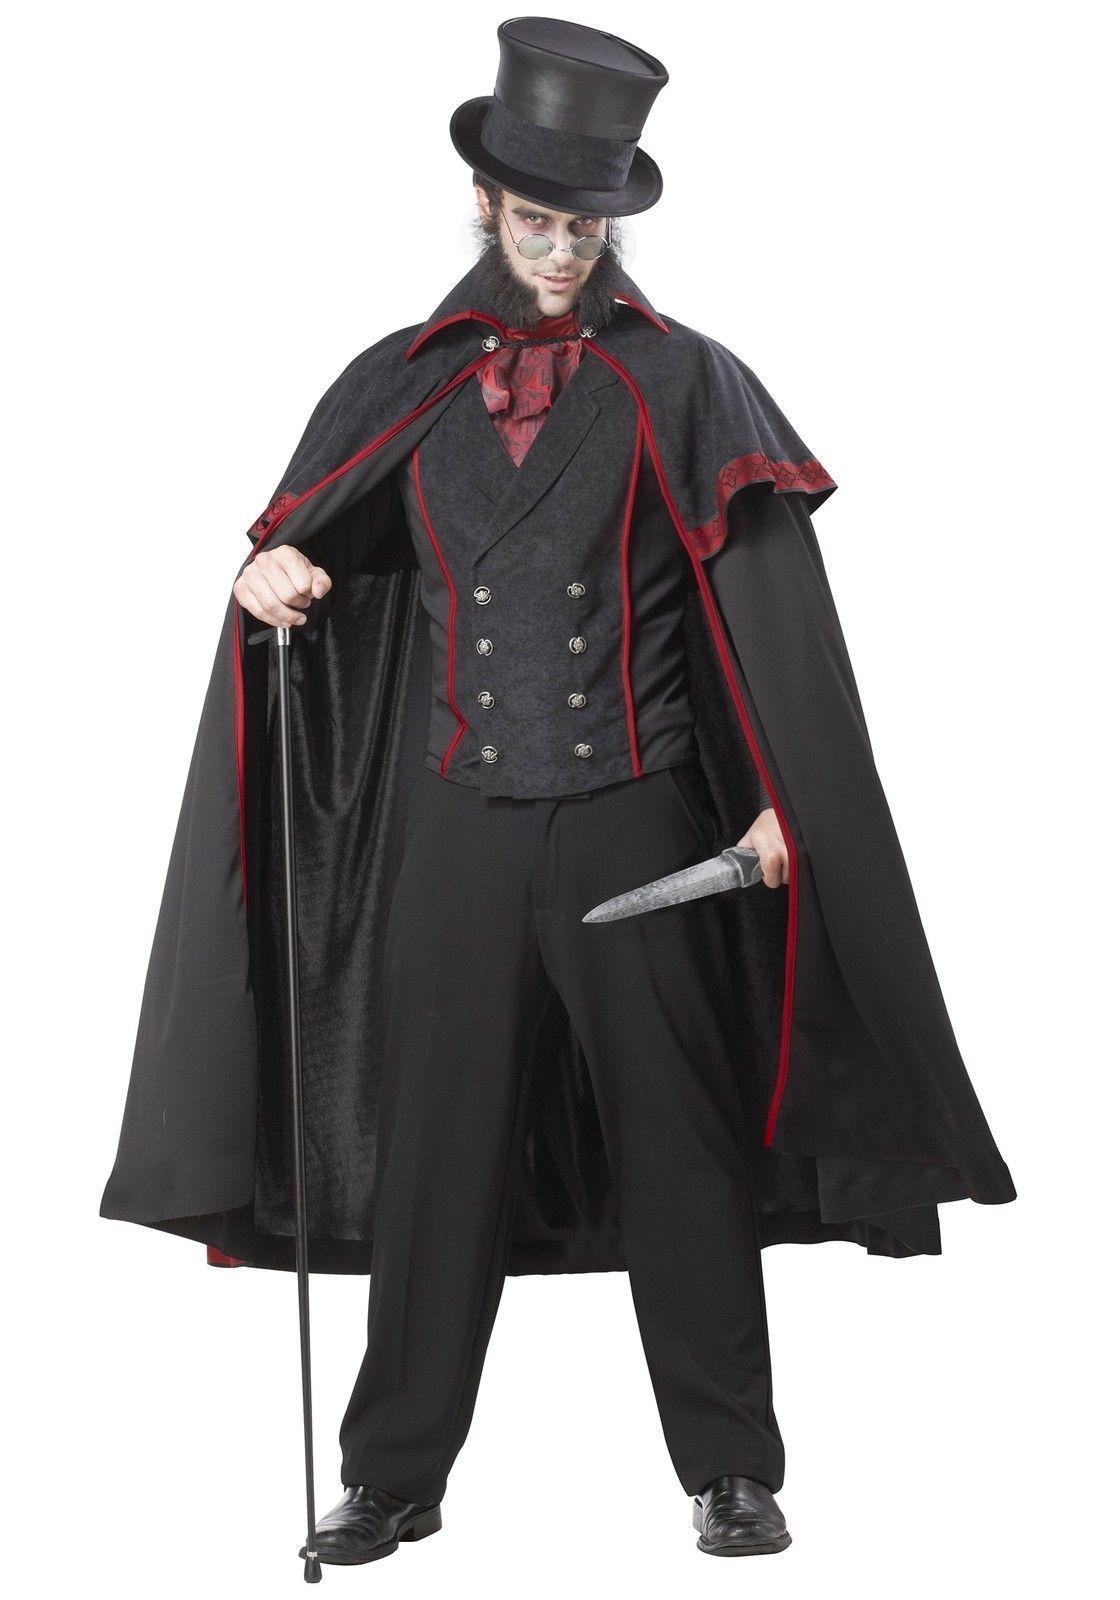 Image is loading Jack-The-Ripper-Men-Halloween-Costume-V&ire-Adult-  sc 1 st  eBay & Jack The Ripper Men Halloween Costume Vampire Adult Victorian ...